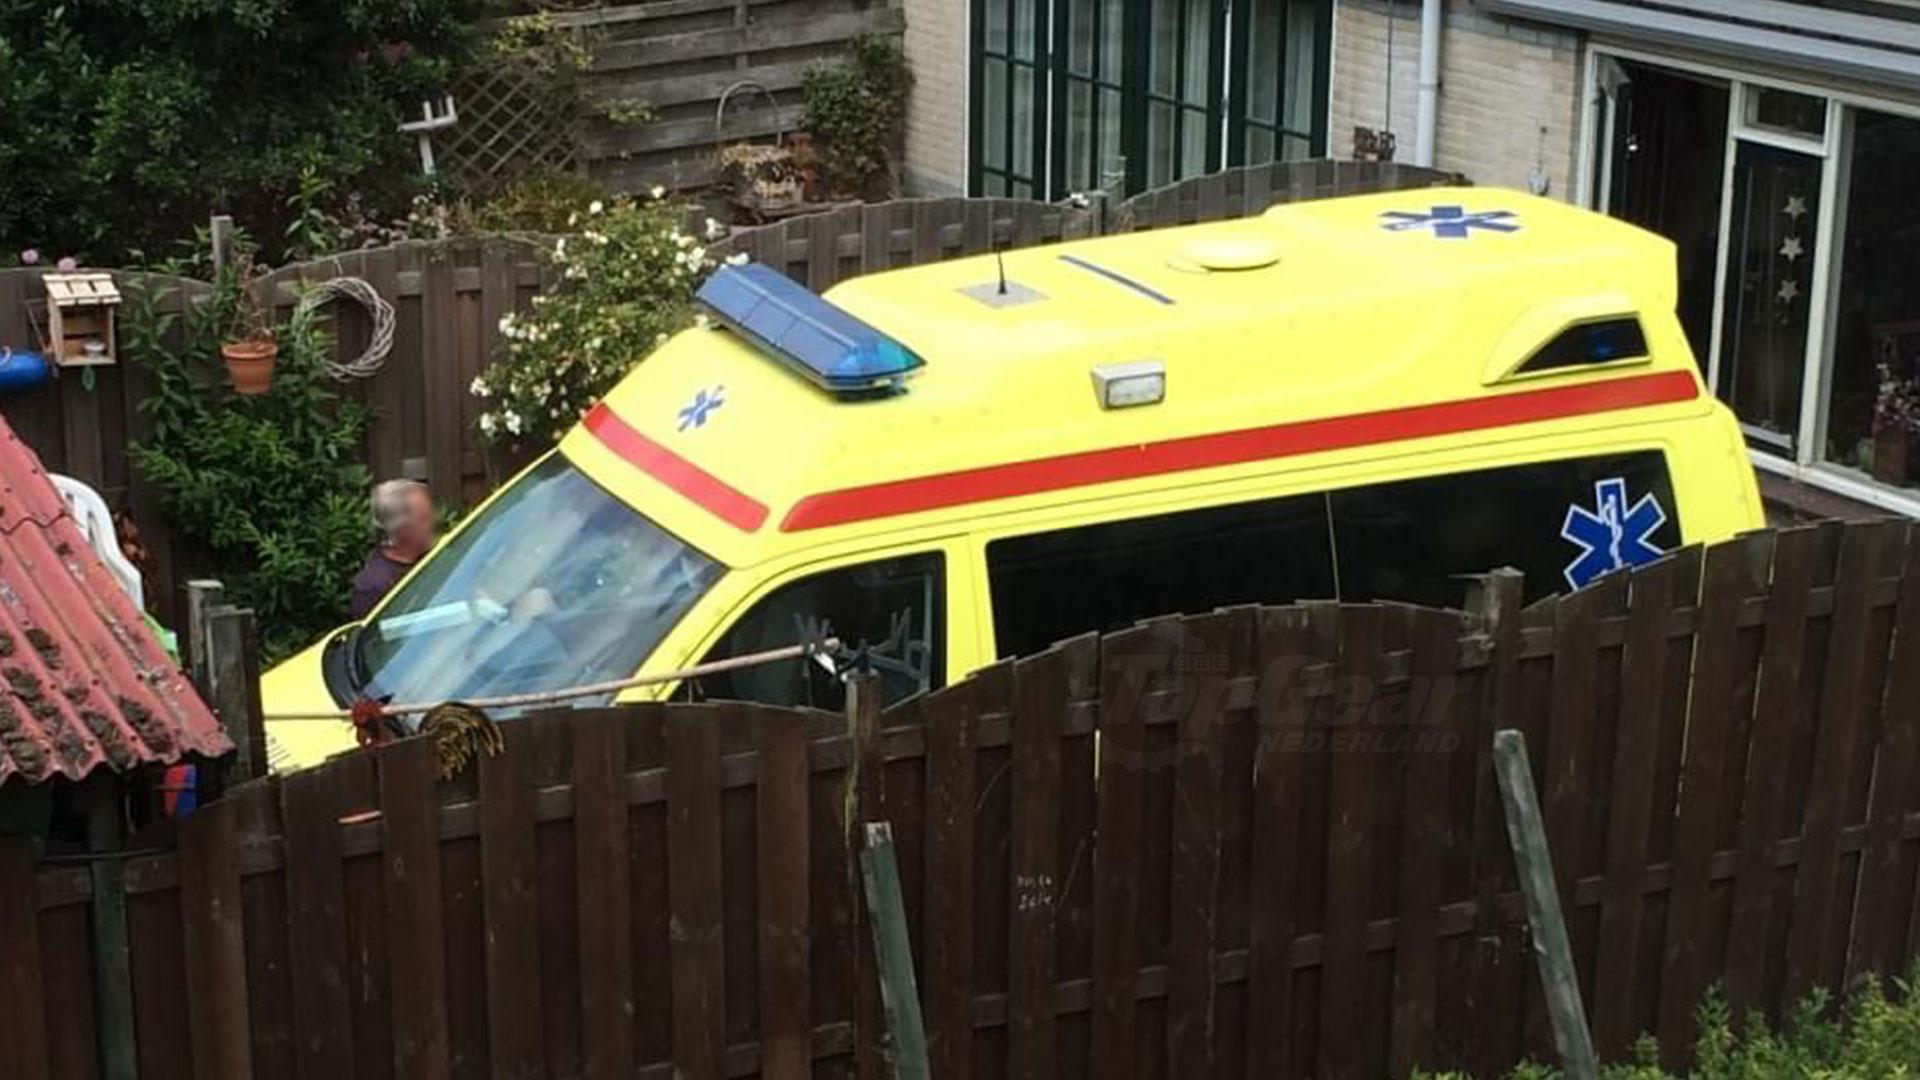 Ambulance in de achtertuin